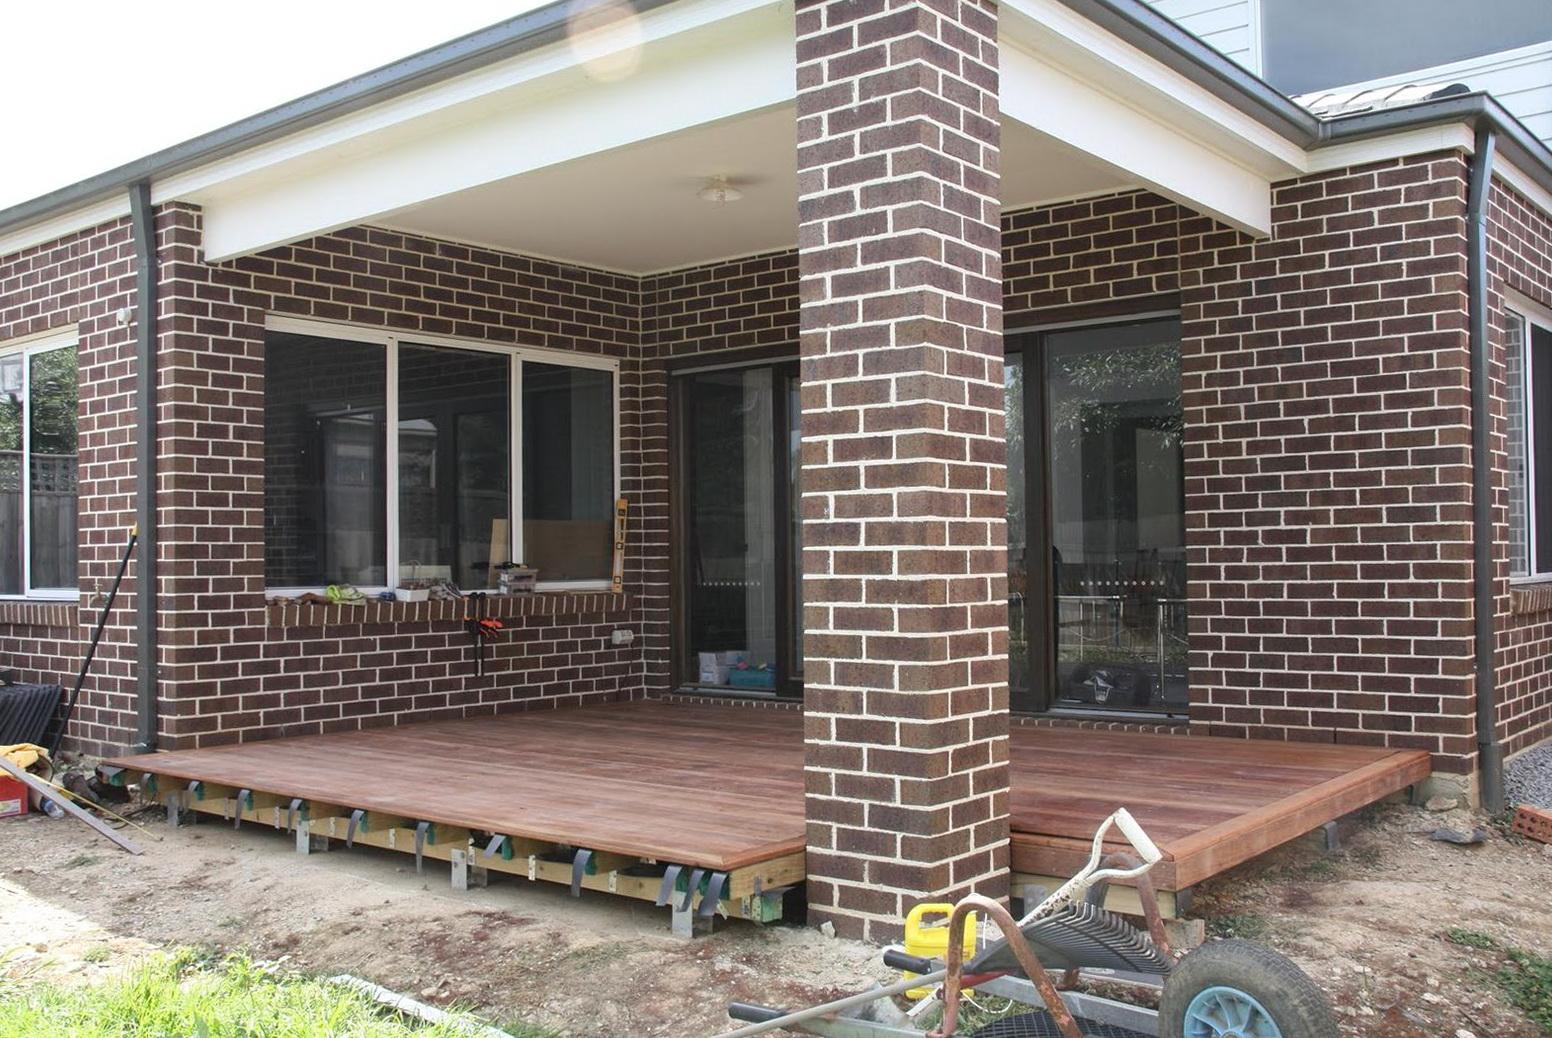 Diy Screen Porch On Concrete Slab Home Design Ideas